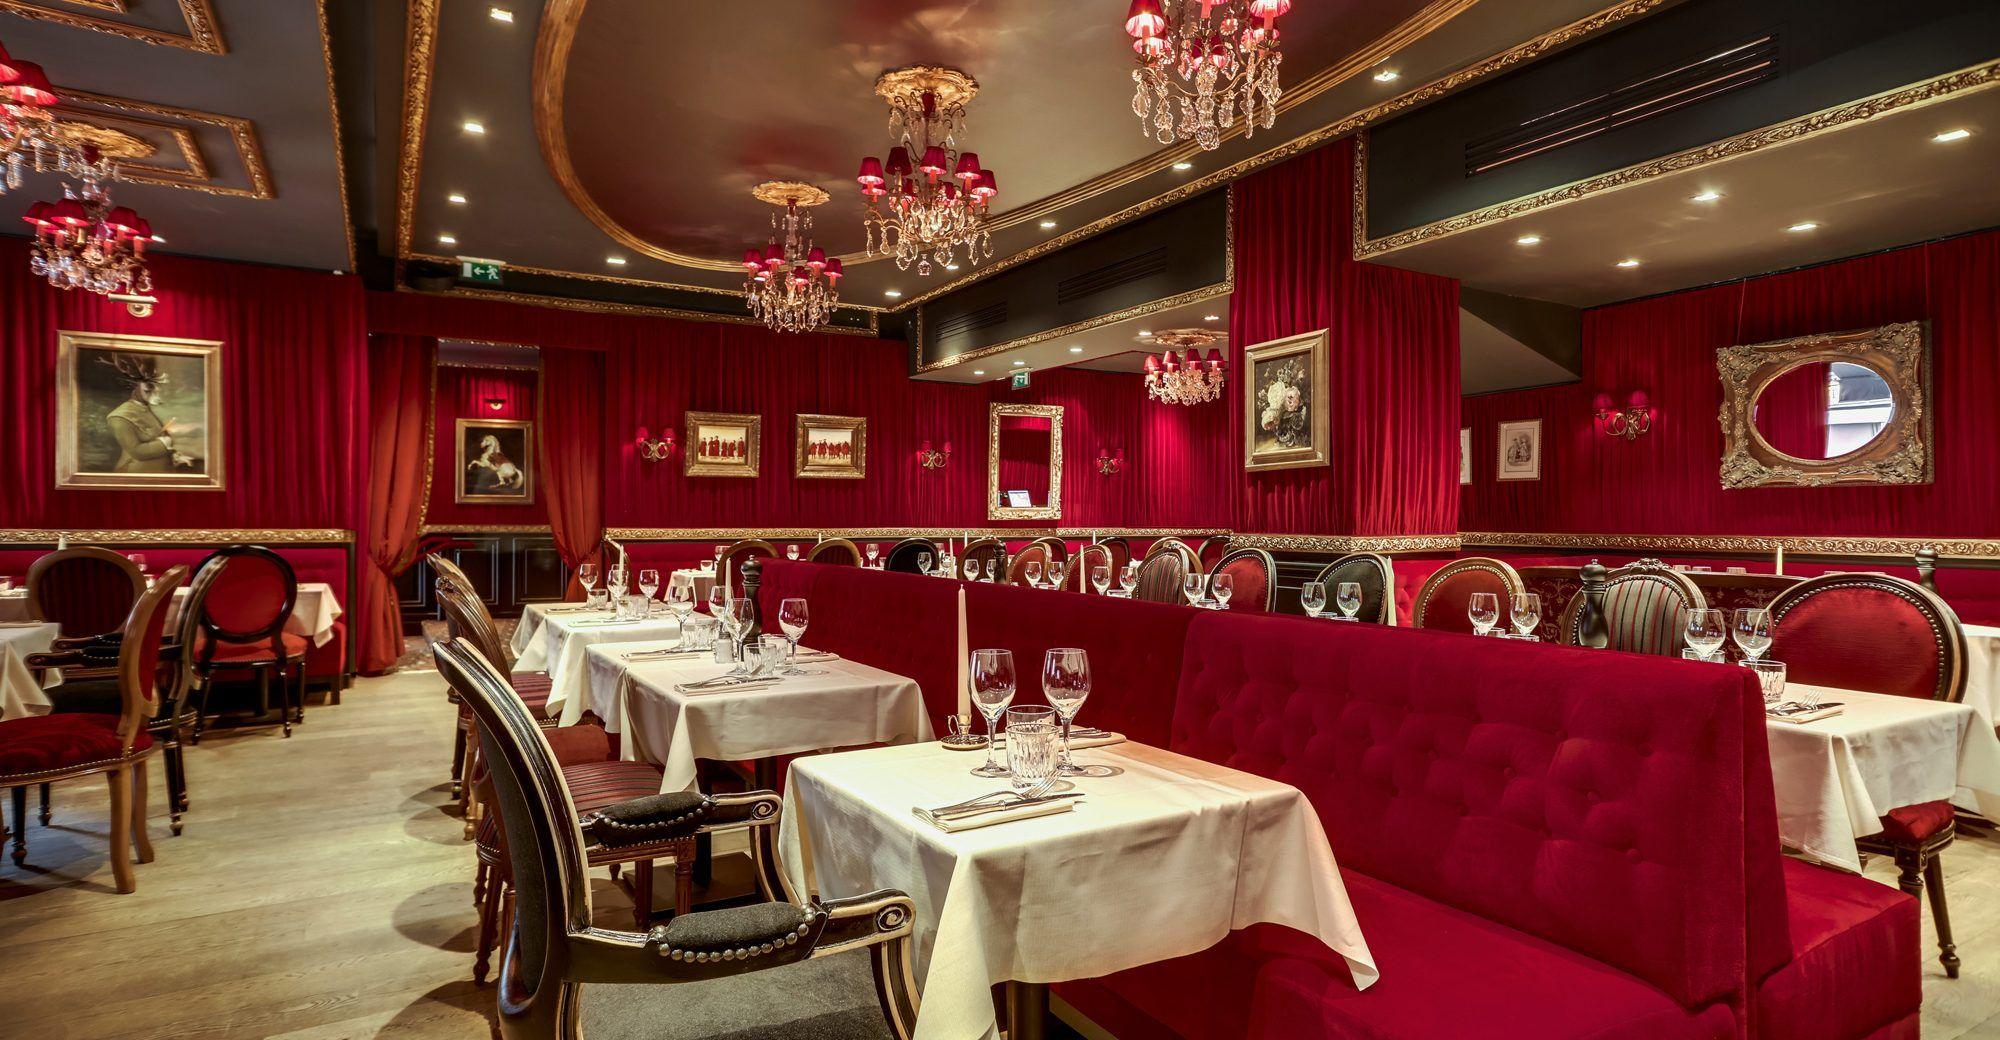 Le Piaf Paris Google Search Restaurant Piano Bar Restaurant Bar